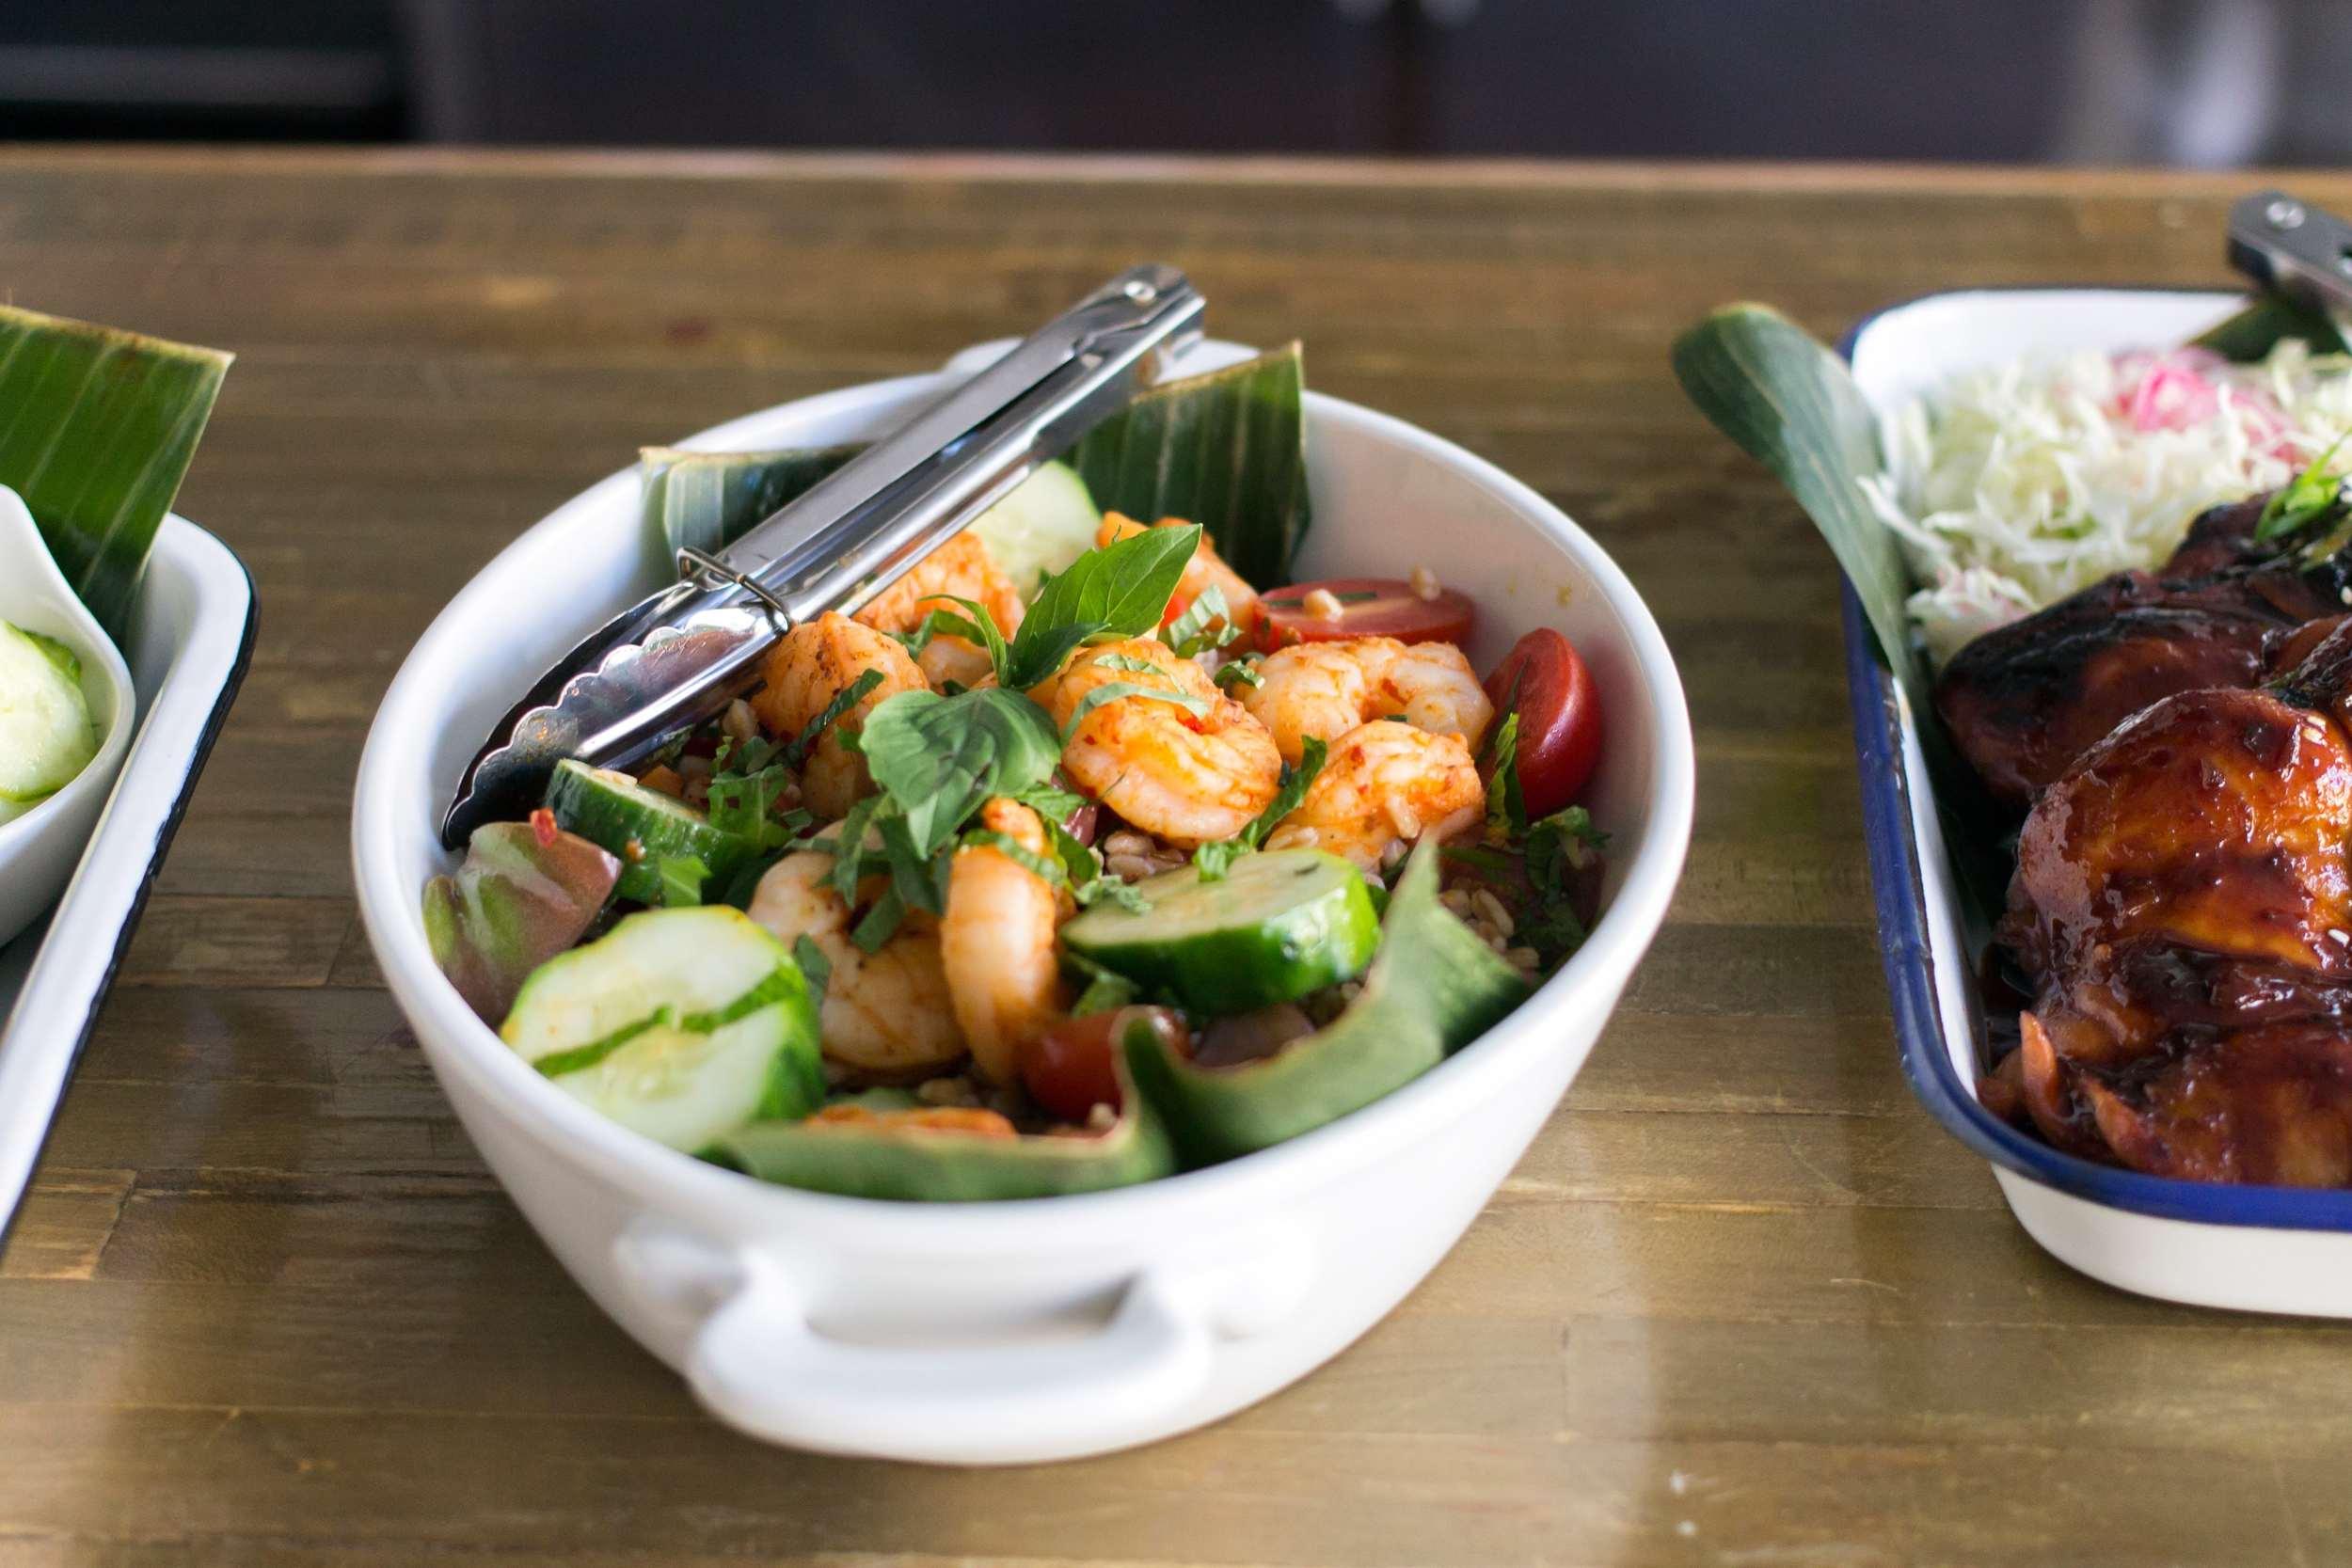 sandy-ley-holsum-foods-restaurant-concept-design